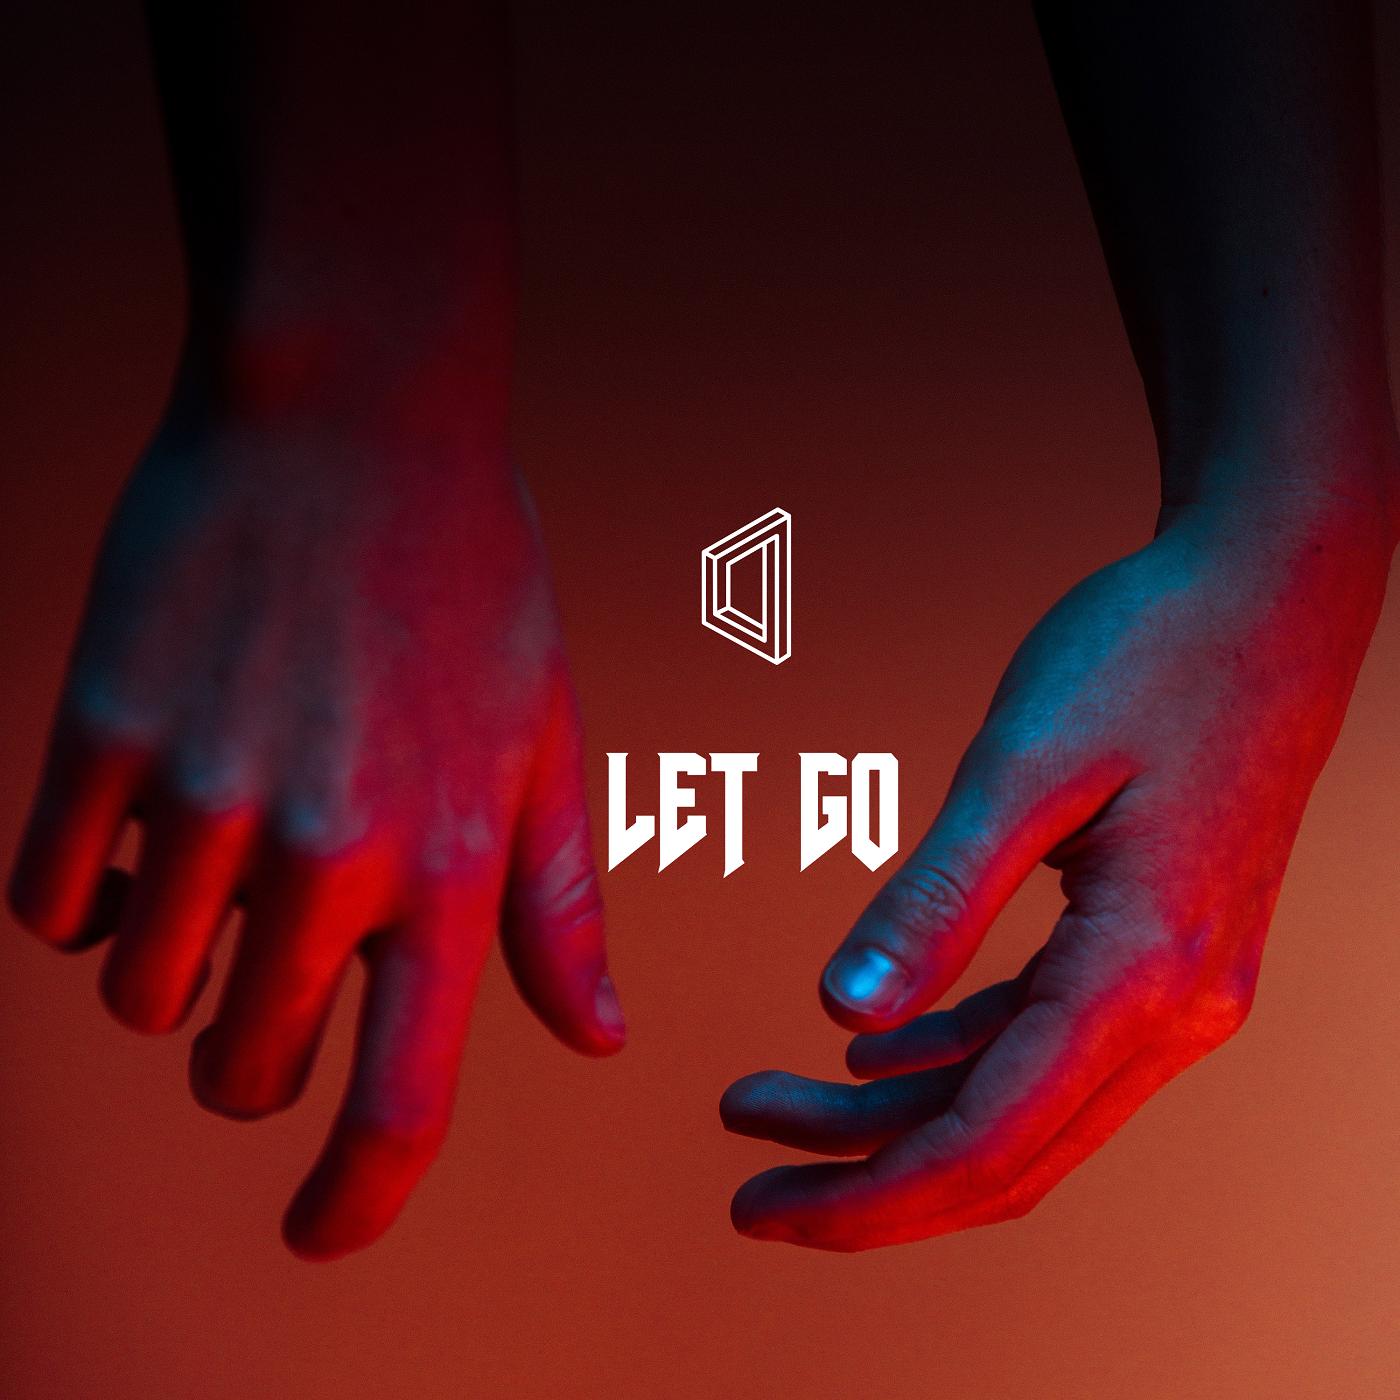 Album cover for Let Go